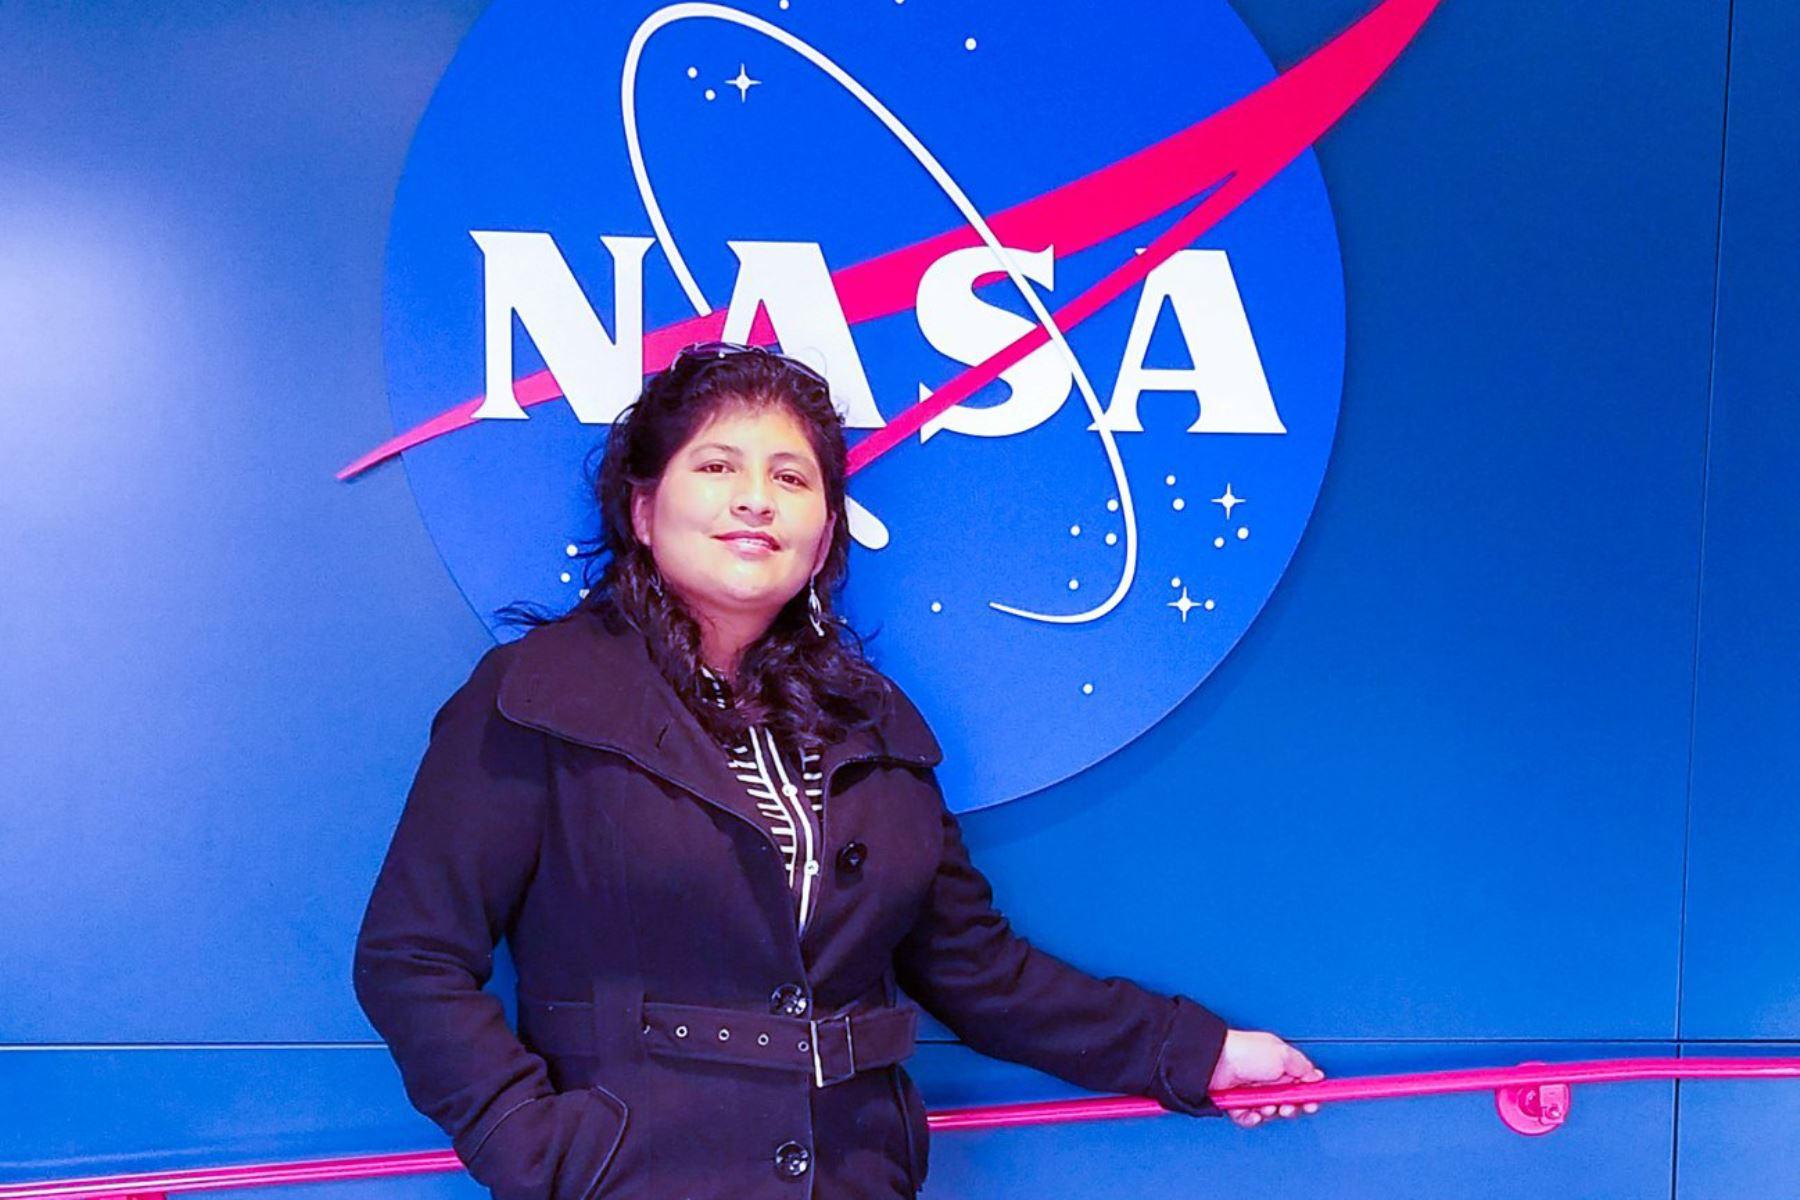 Peruana ingeniera astronauta que trabaja en la NASA es homenajeada por CNN